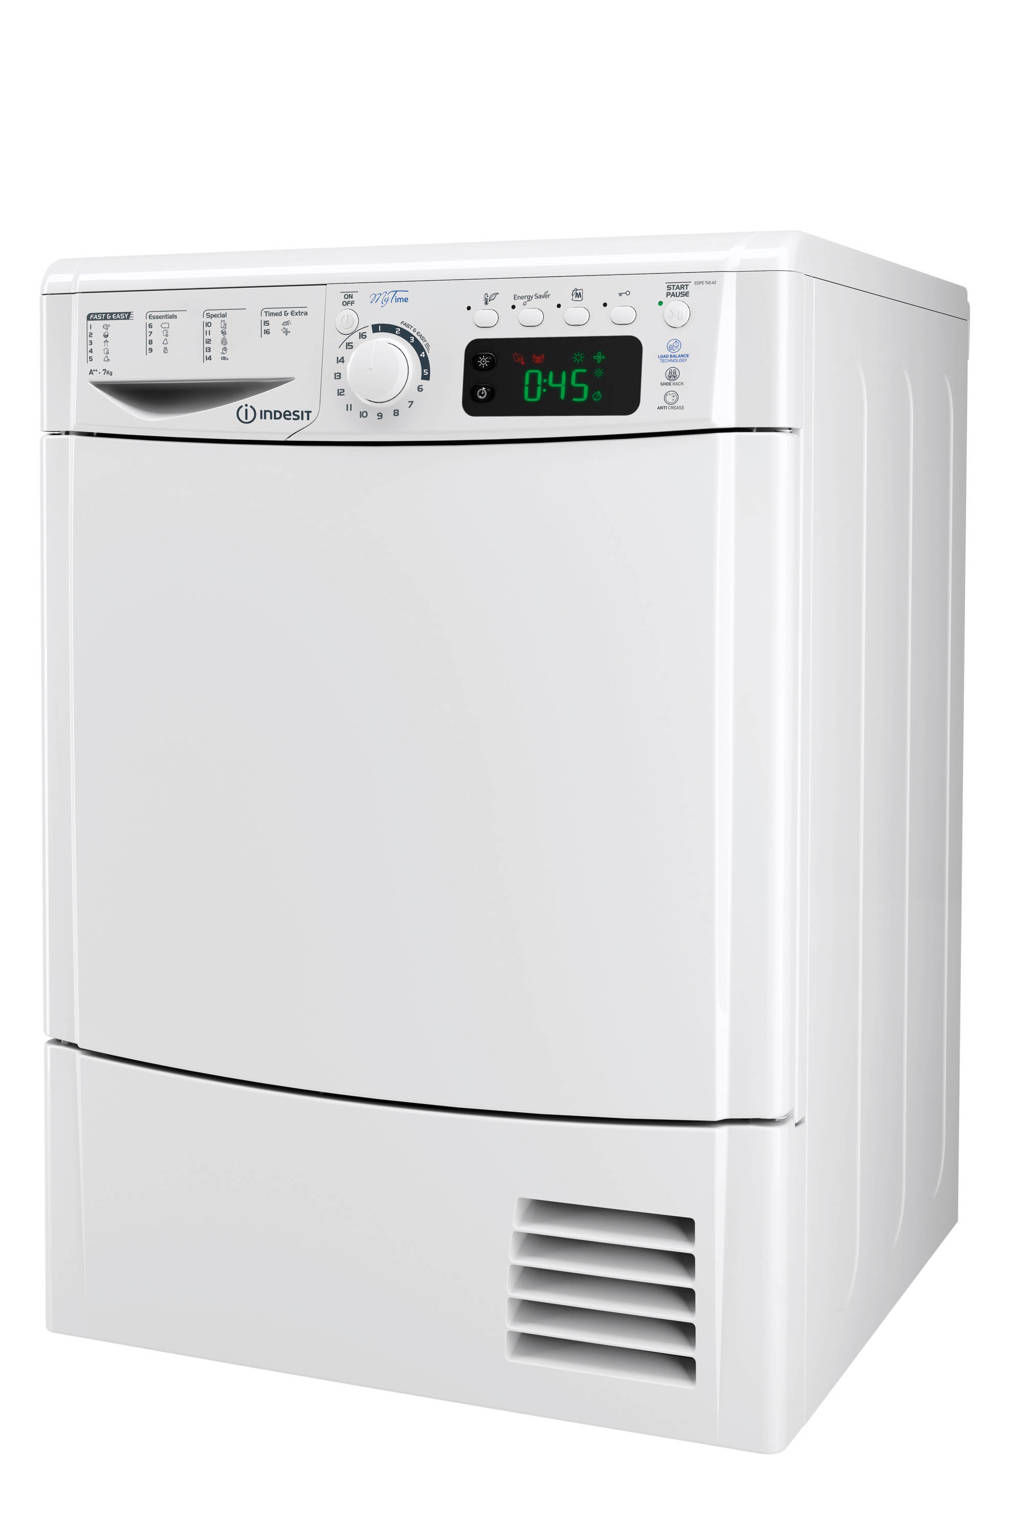 Indesit EDPE 745 A2 ECO EU warmtepompdroger